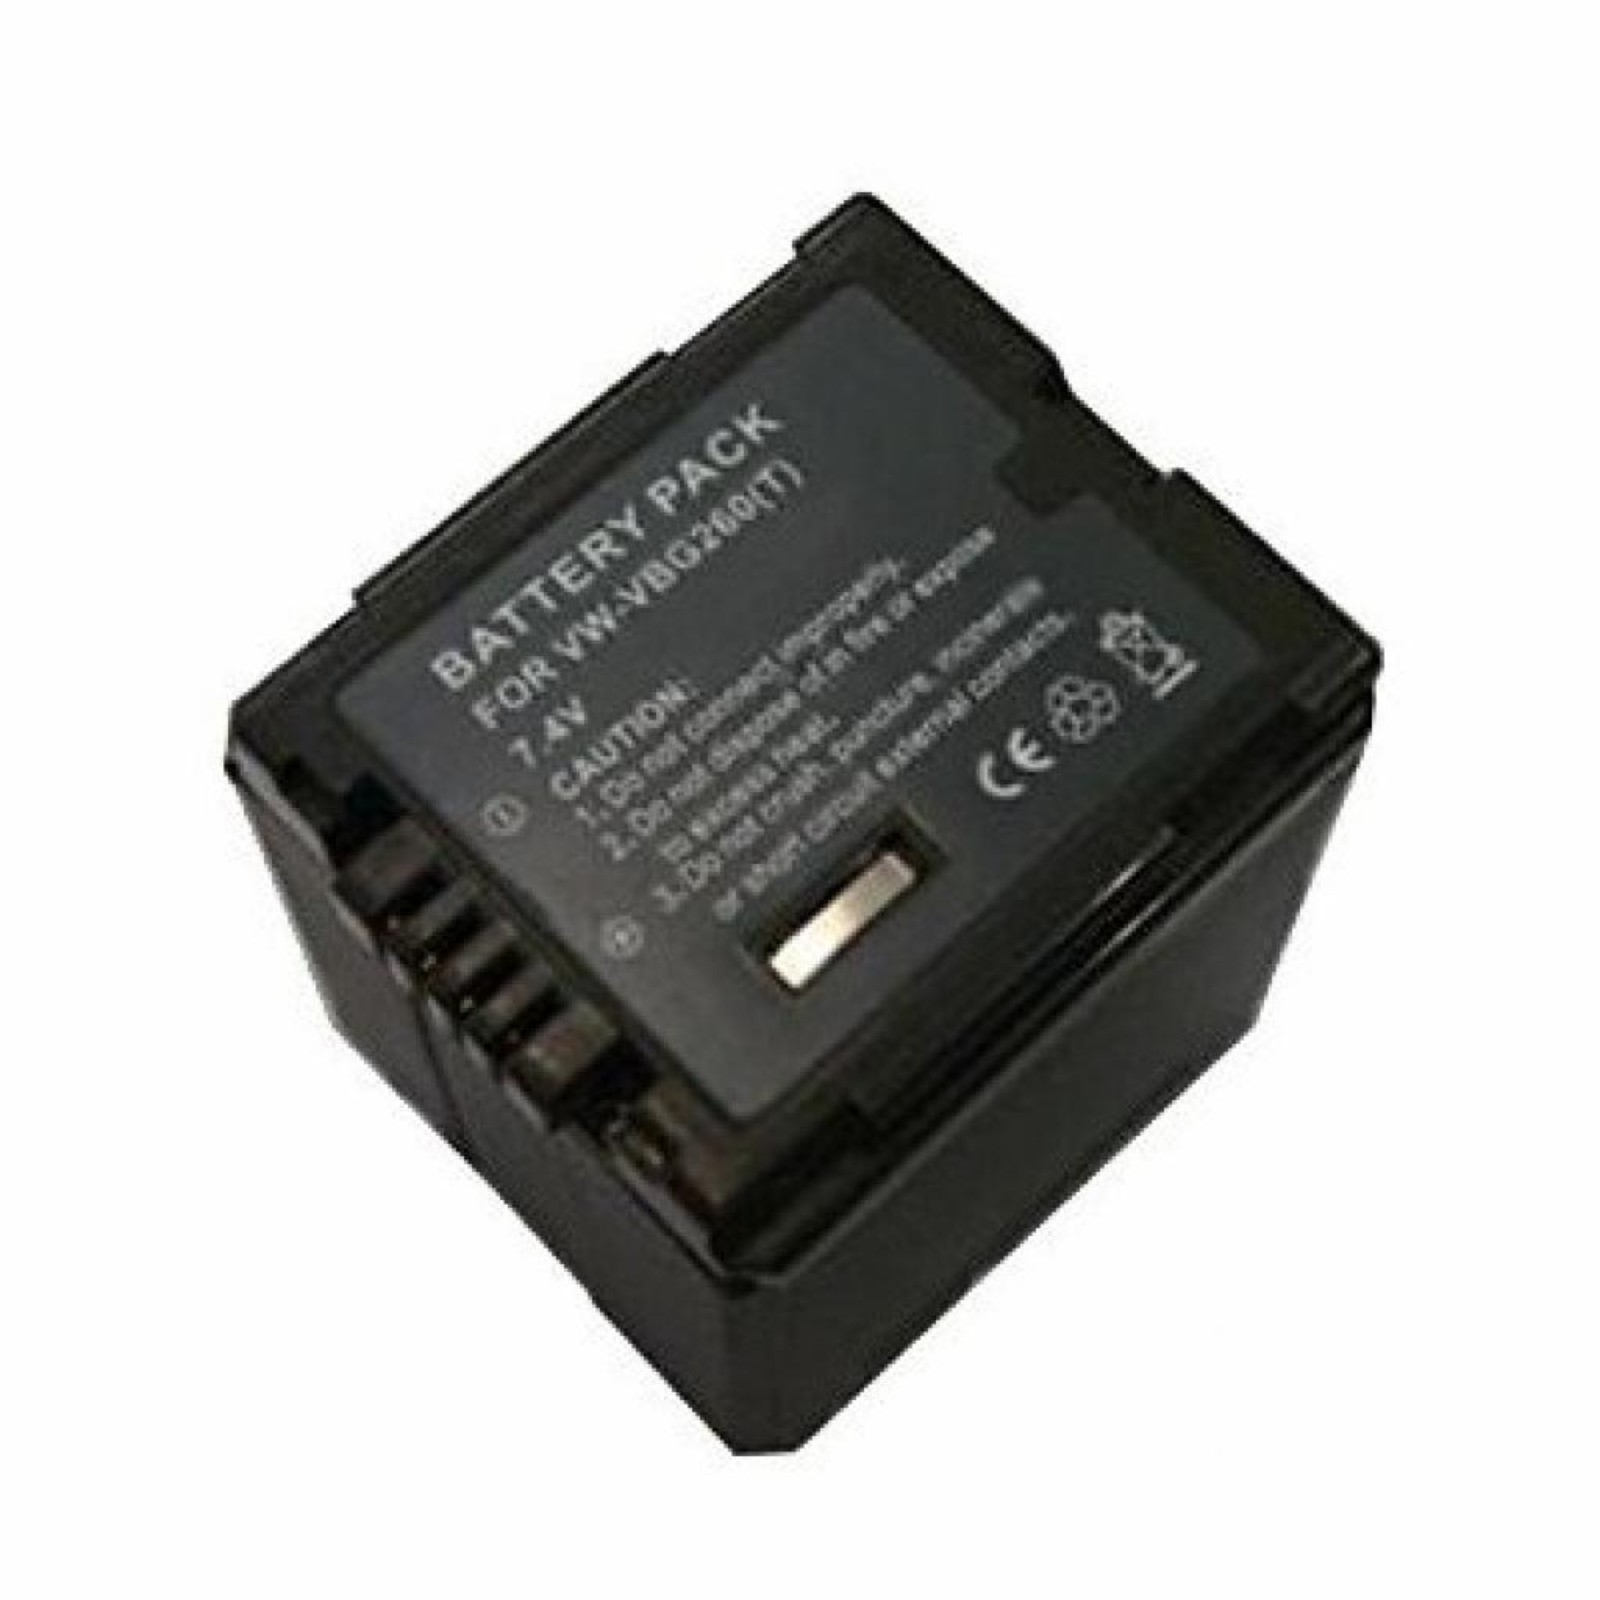 Аккумулятор к фото/видео EXTRADIGITAL Panasonic VW-VBG260 (DV00DV1276)